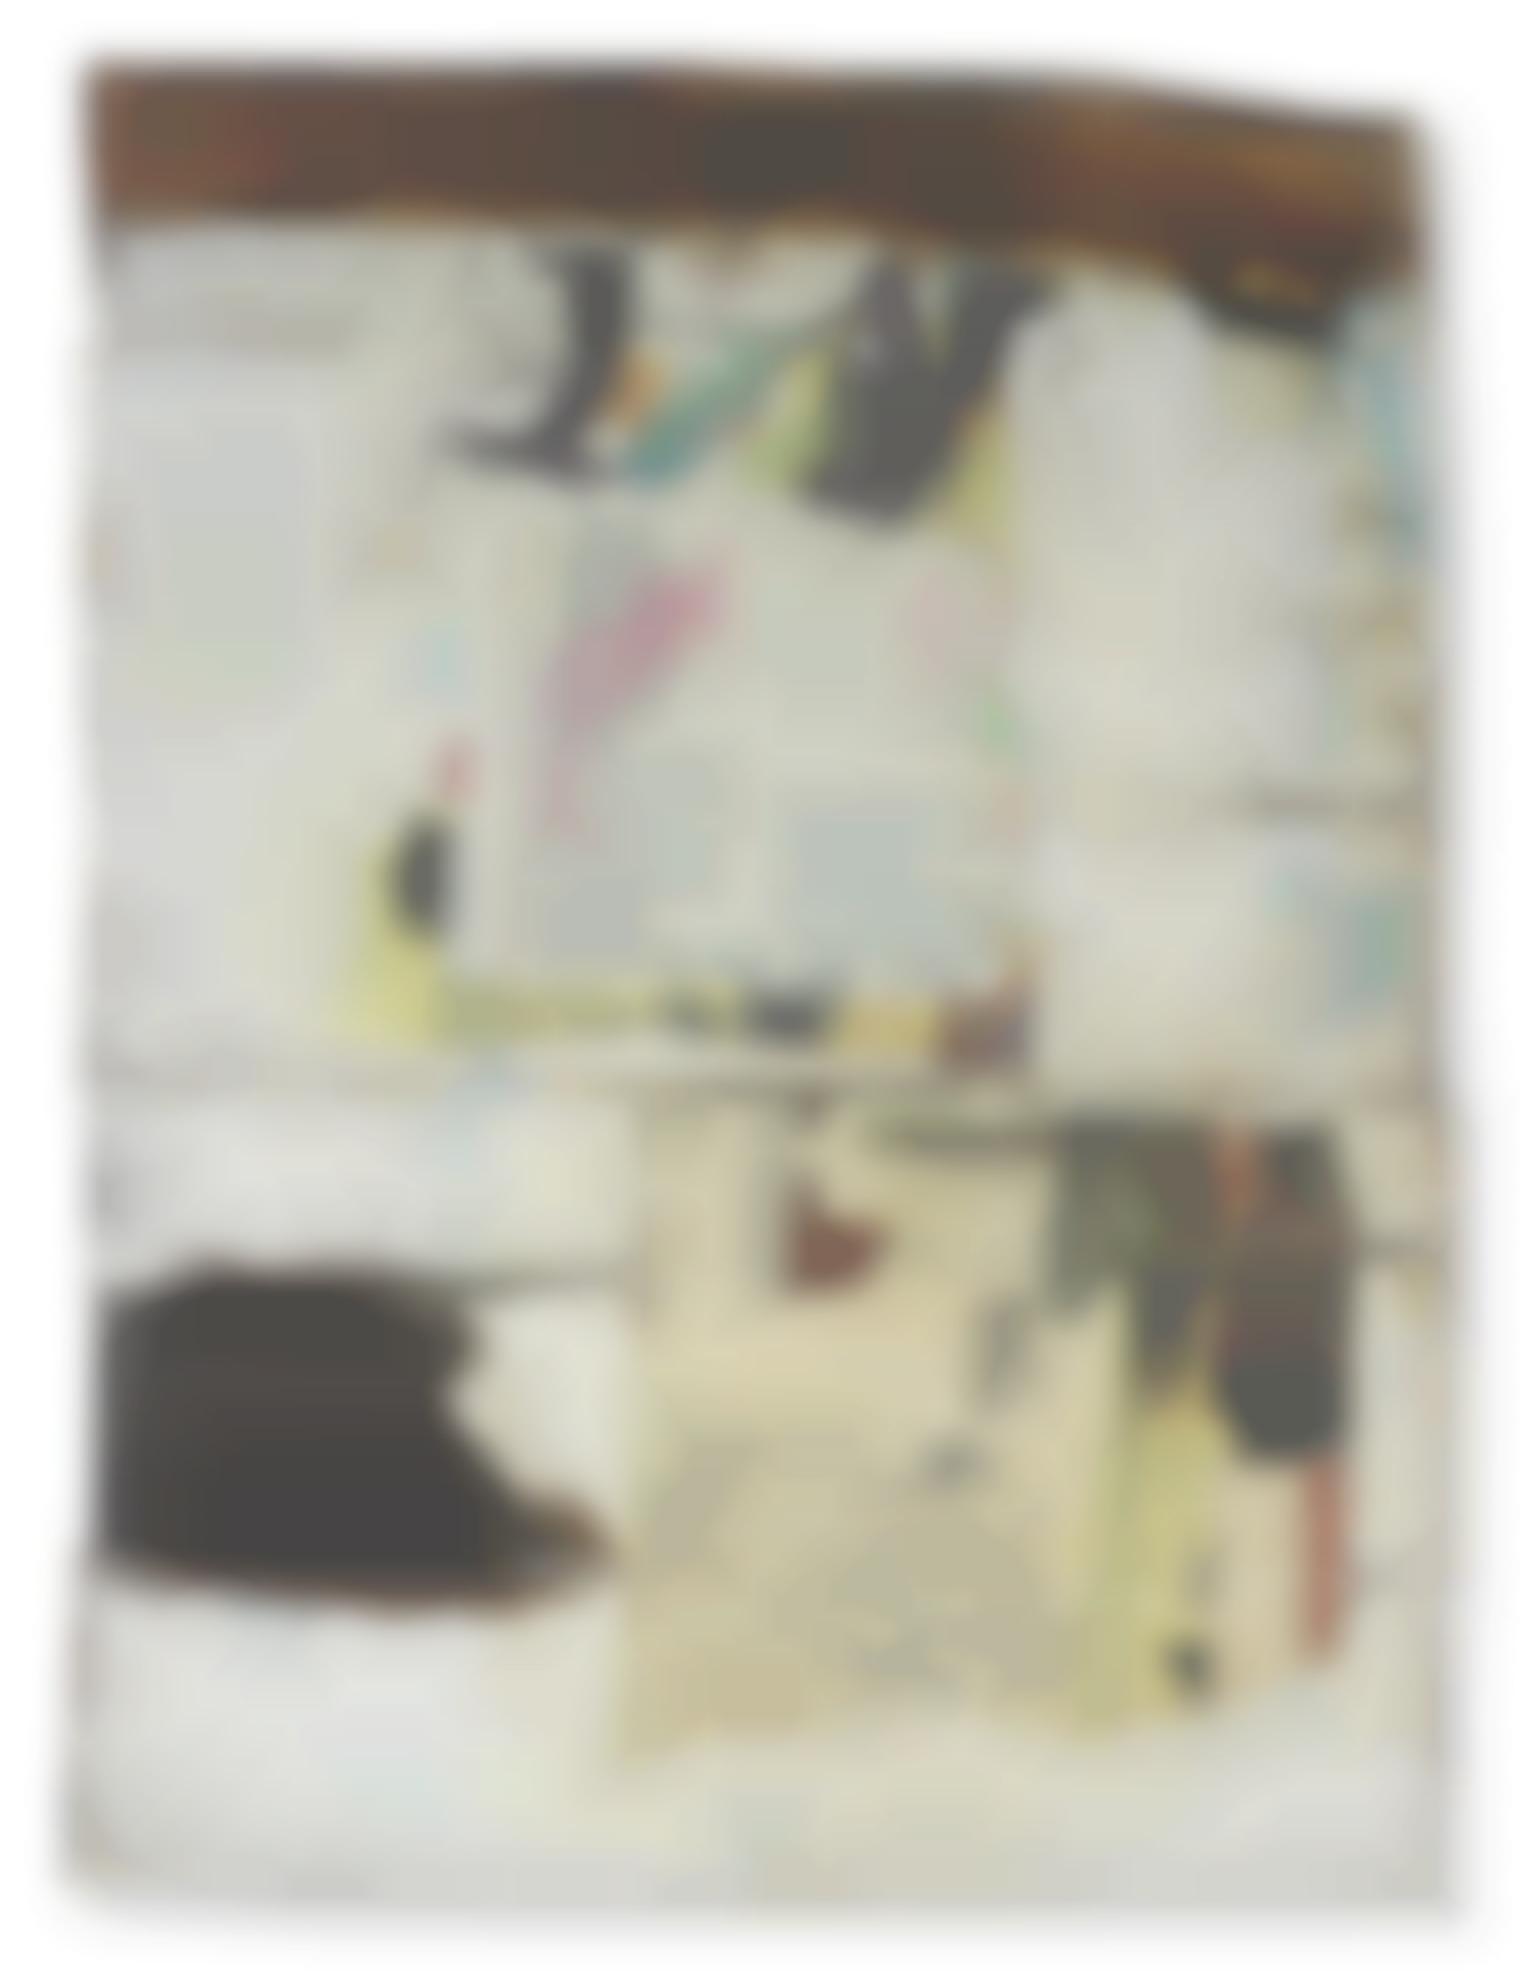 Jean-Michel Basquiat-Untitled-1985